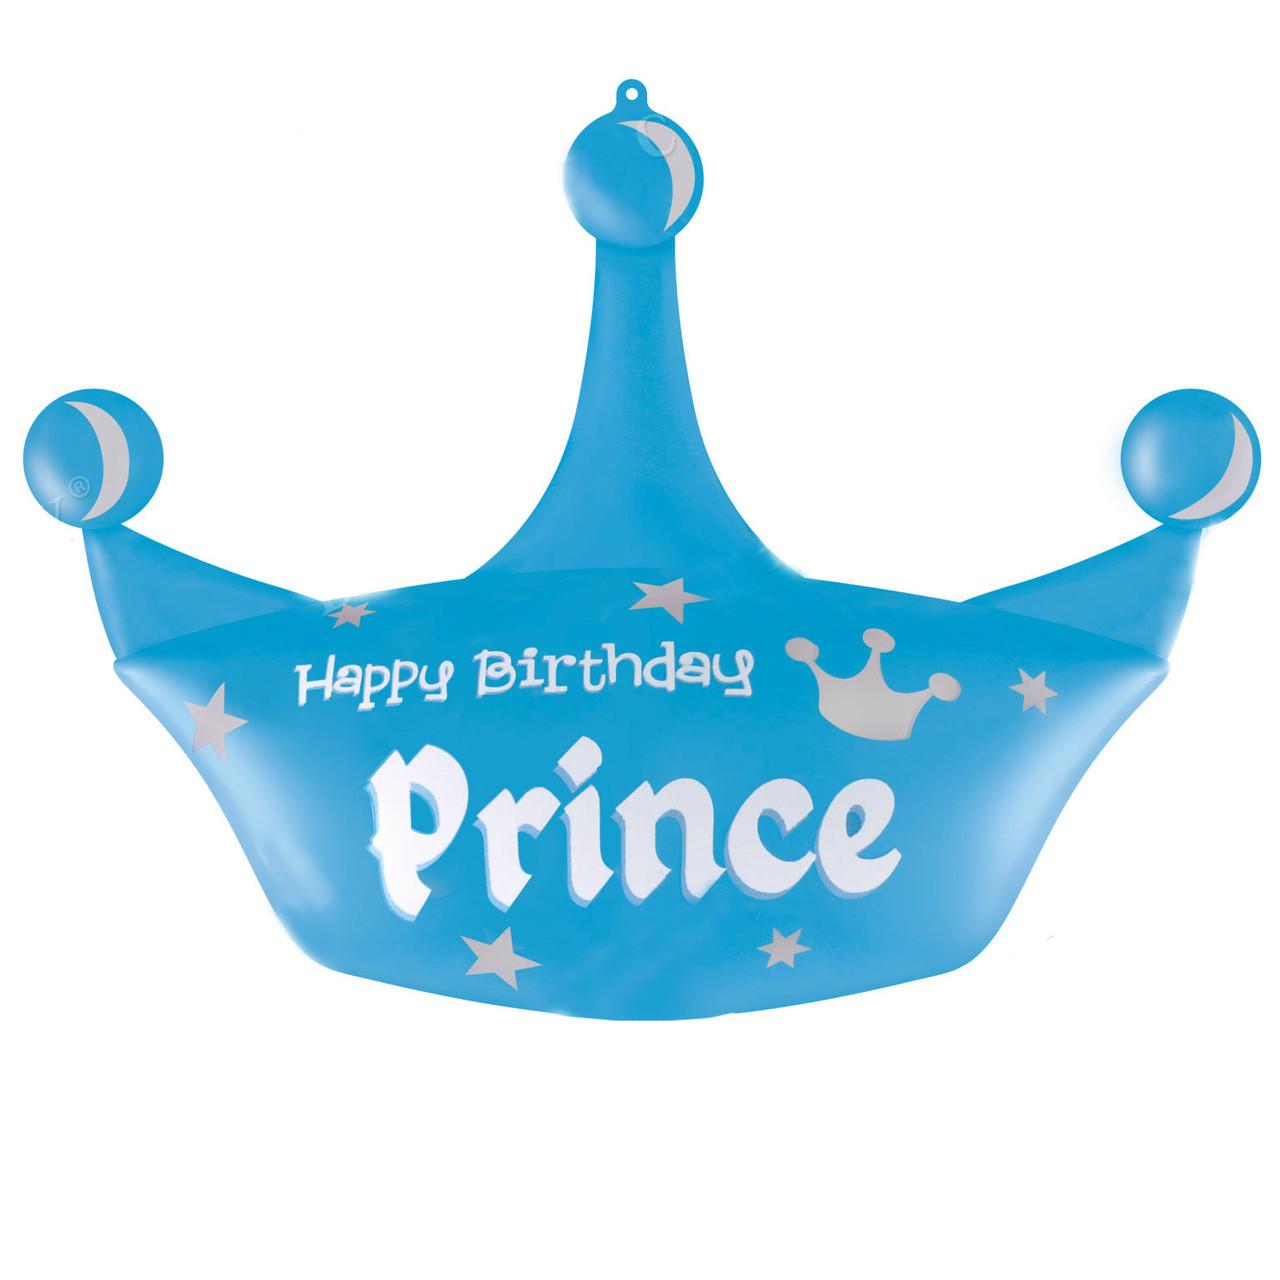 Фол шар фигура ХБ Корона голубая Happy Birthday Prince (Китай)